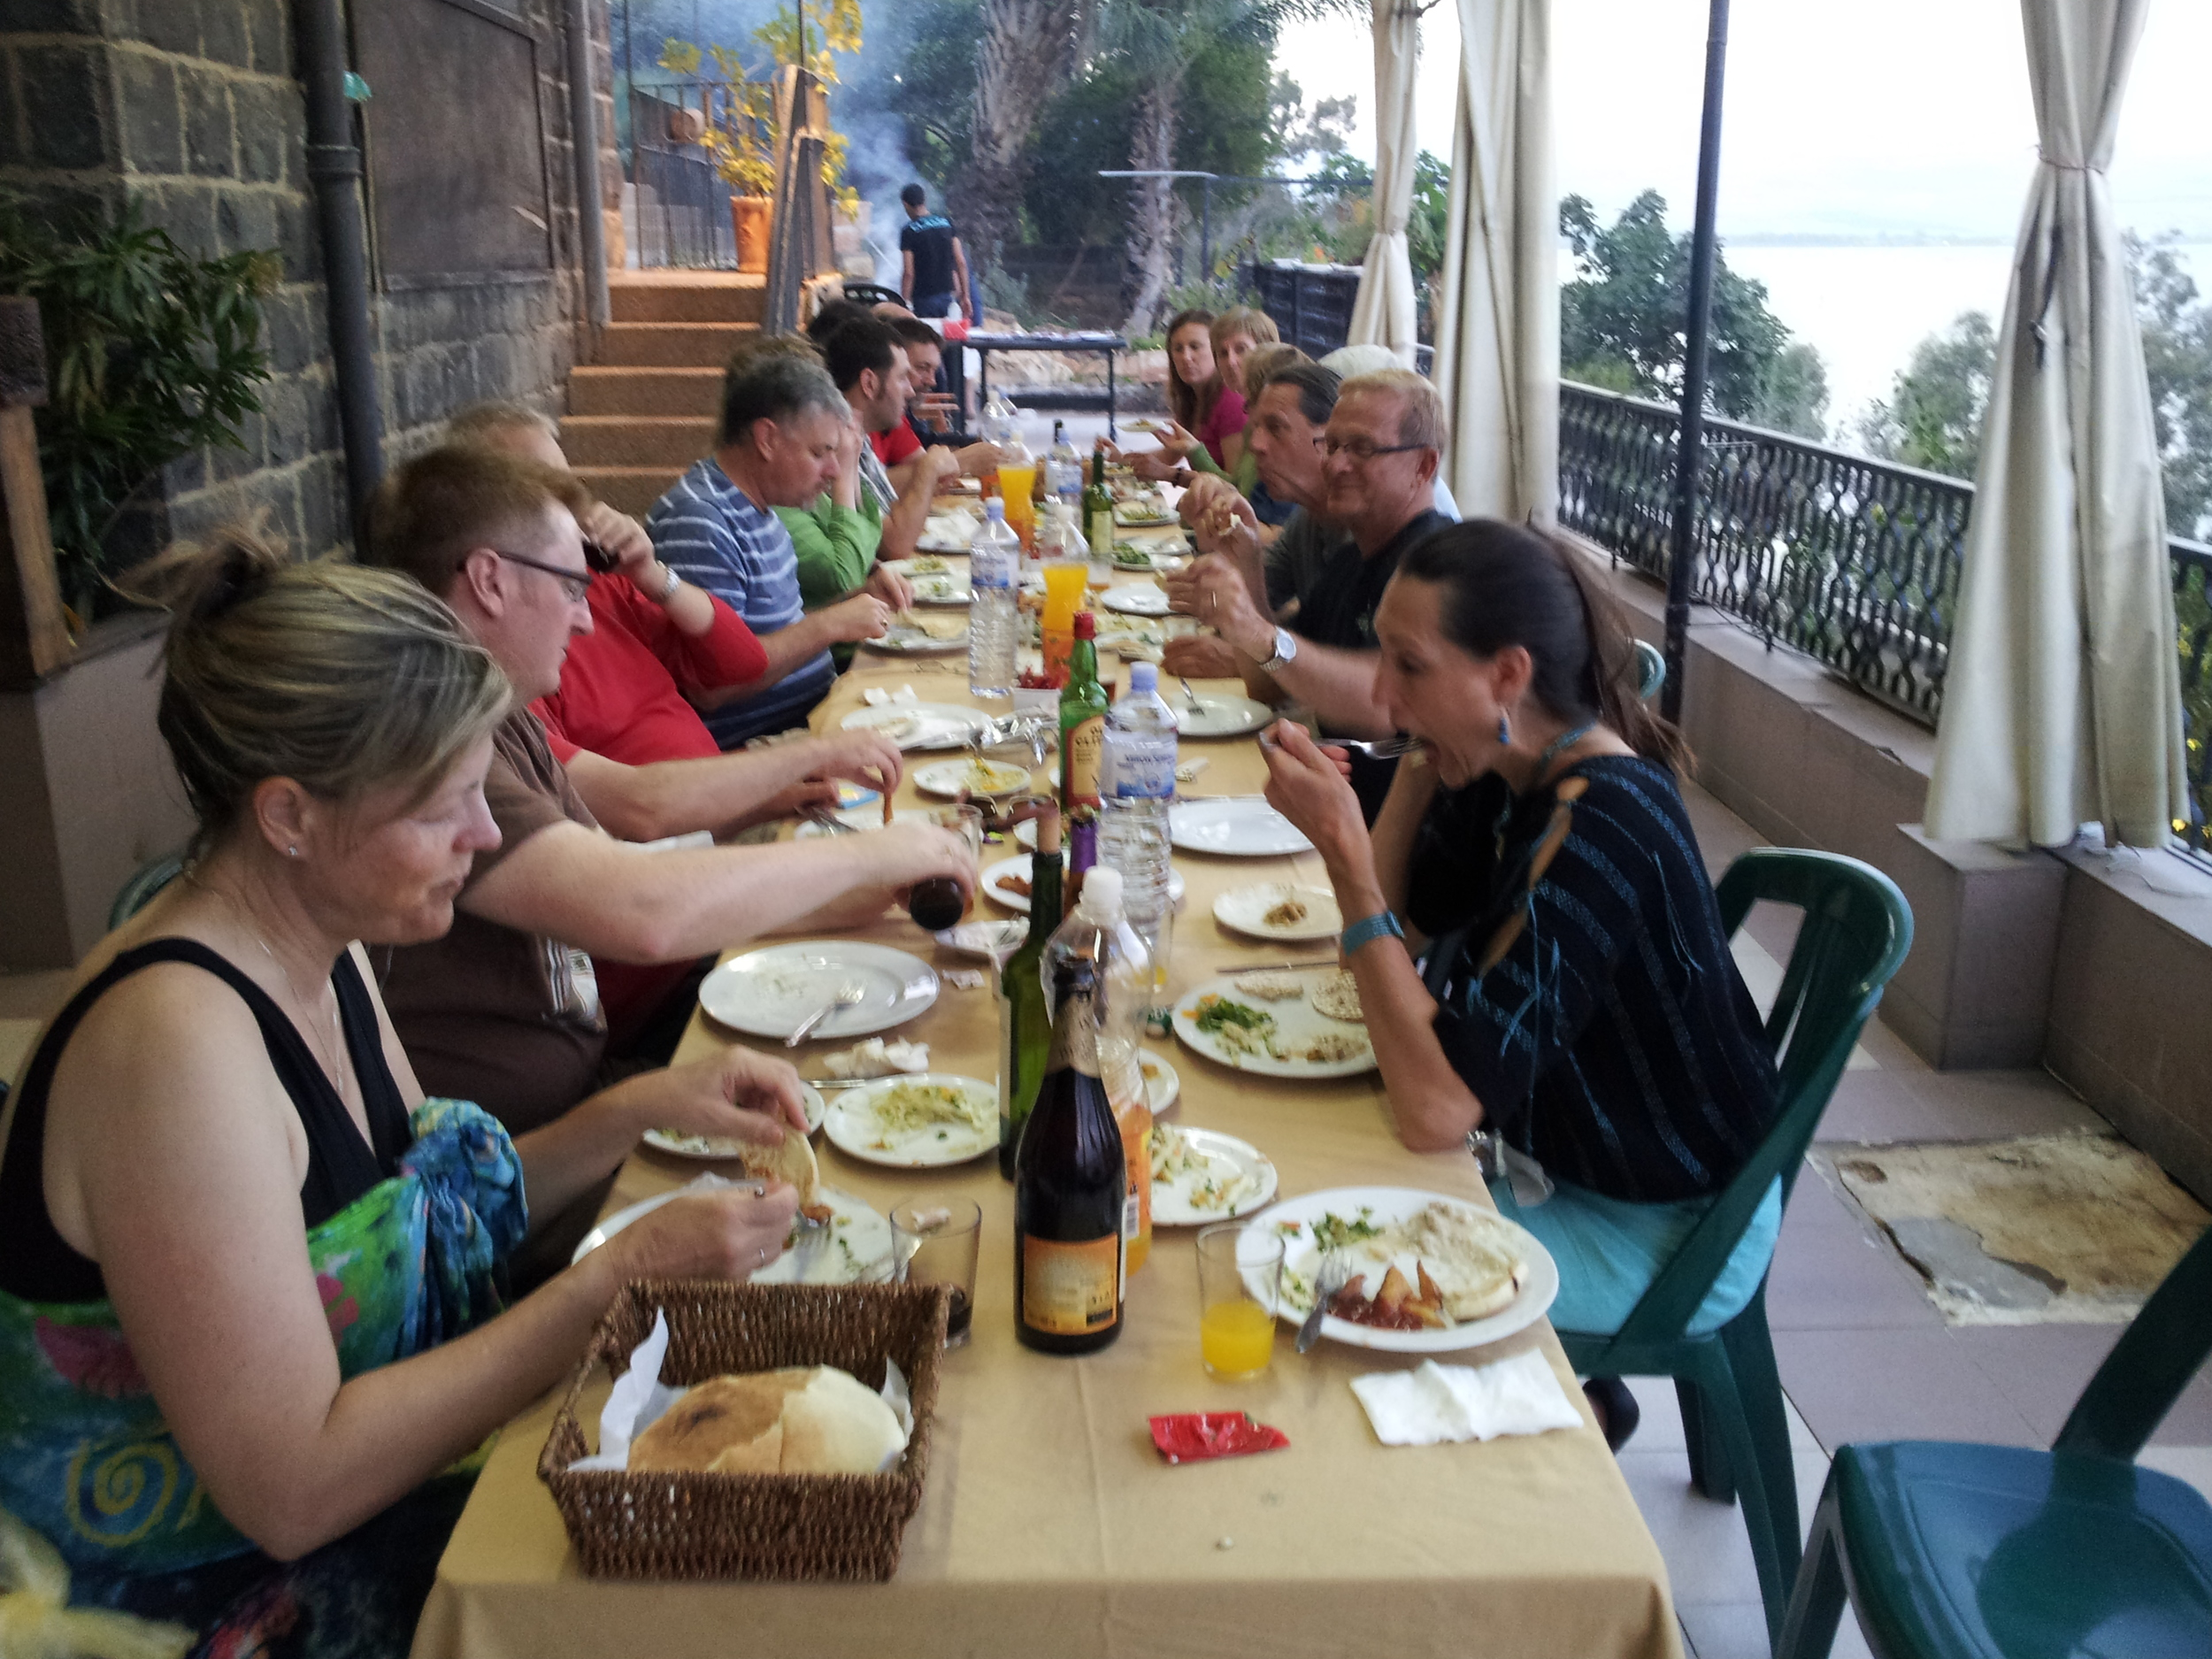 Eating on the veranda overlooking the Sea of Galilee